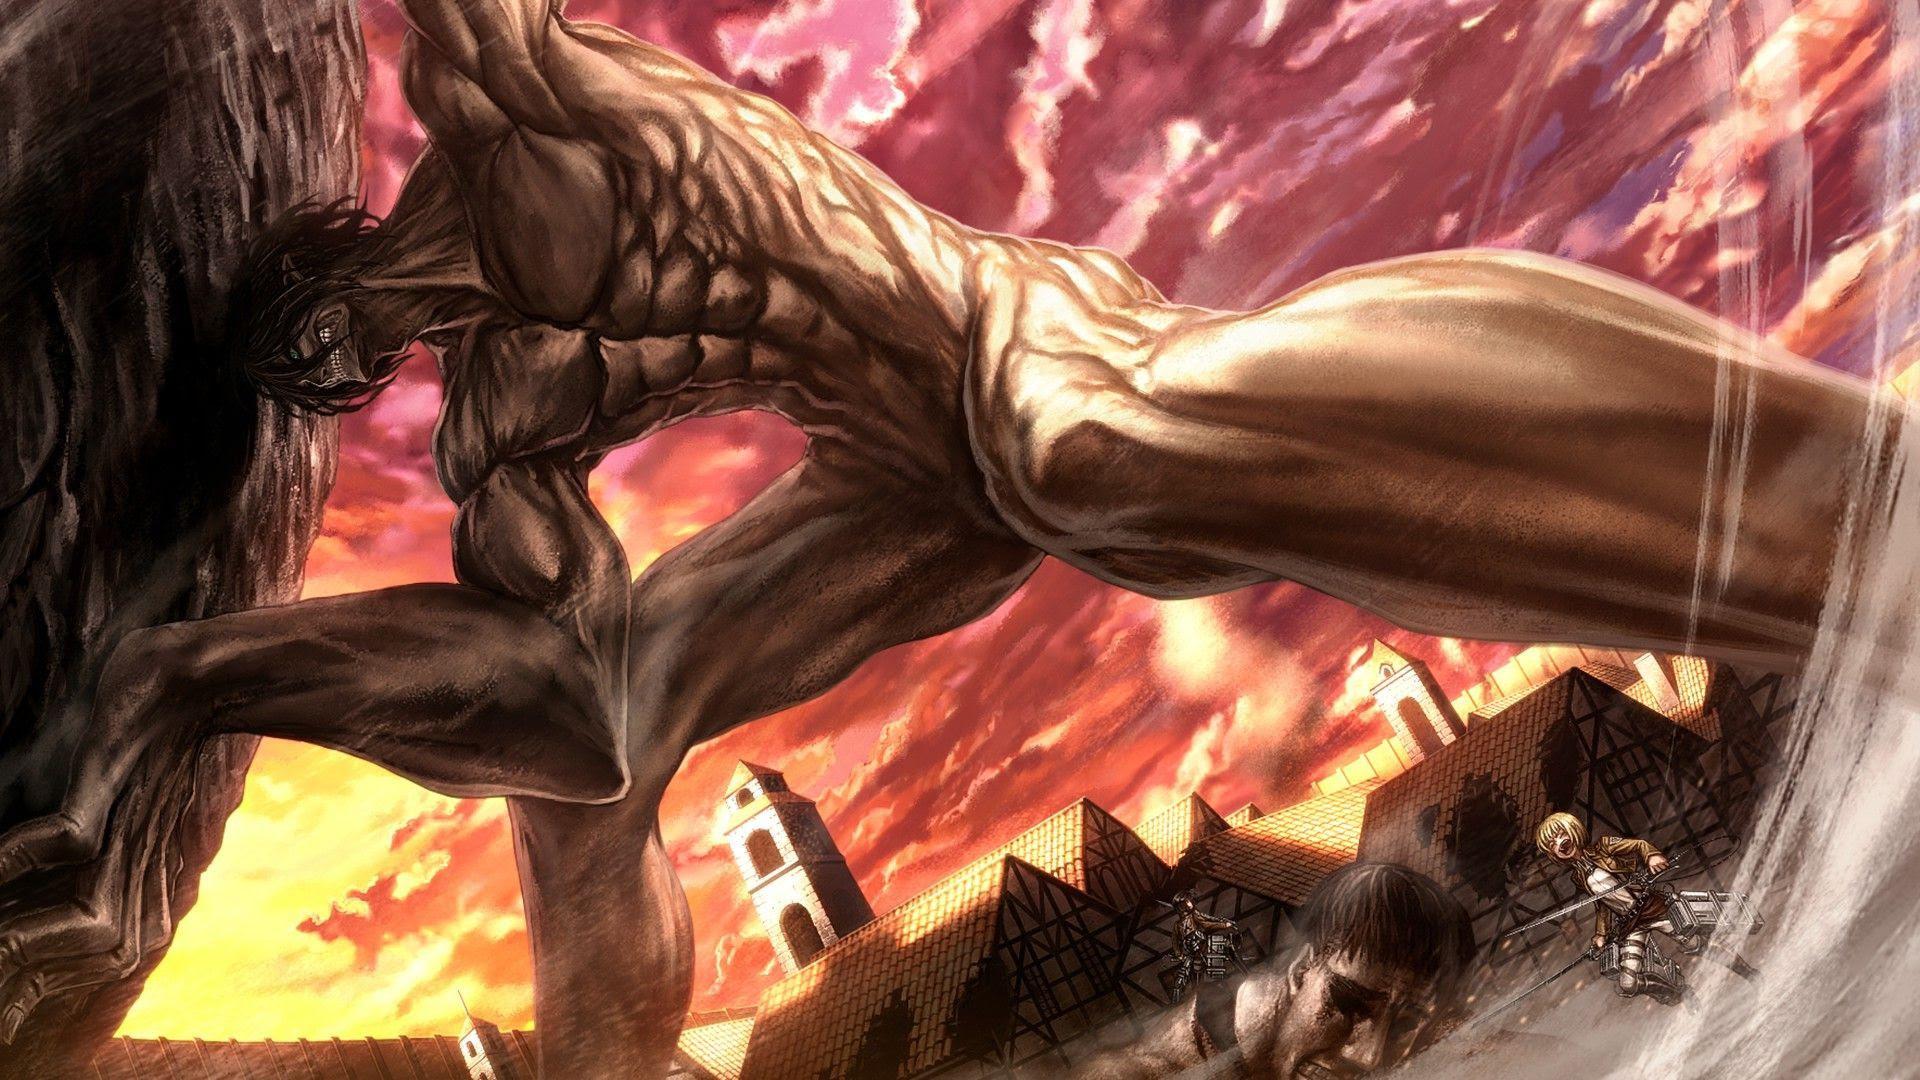 Anime Attack On Titan Wallpaper Anime Wallpapers